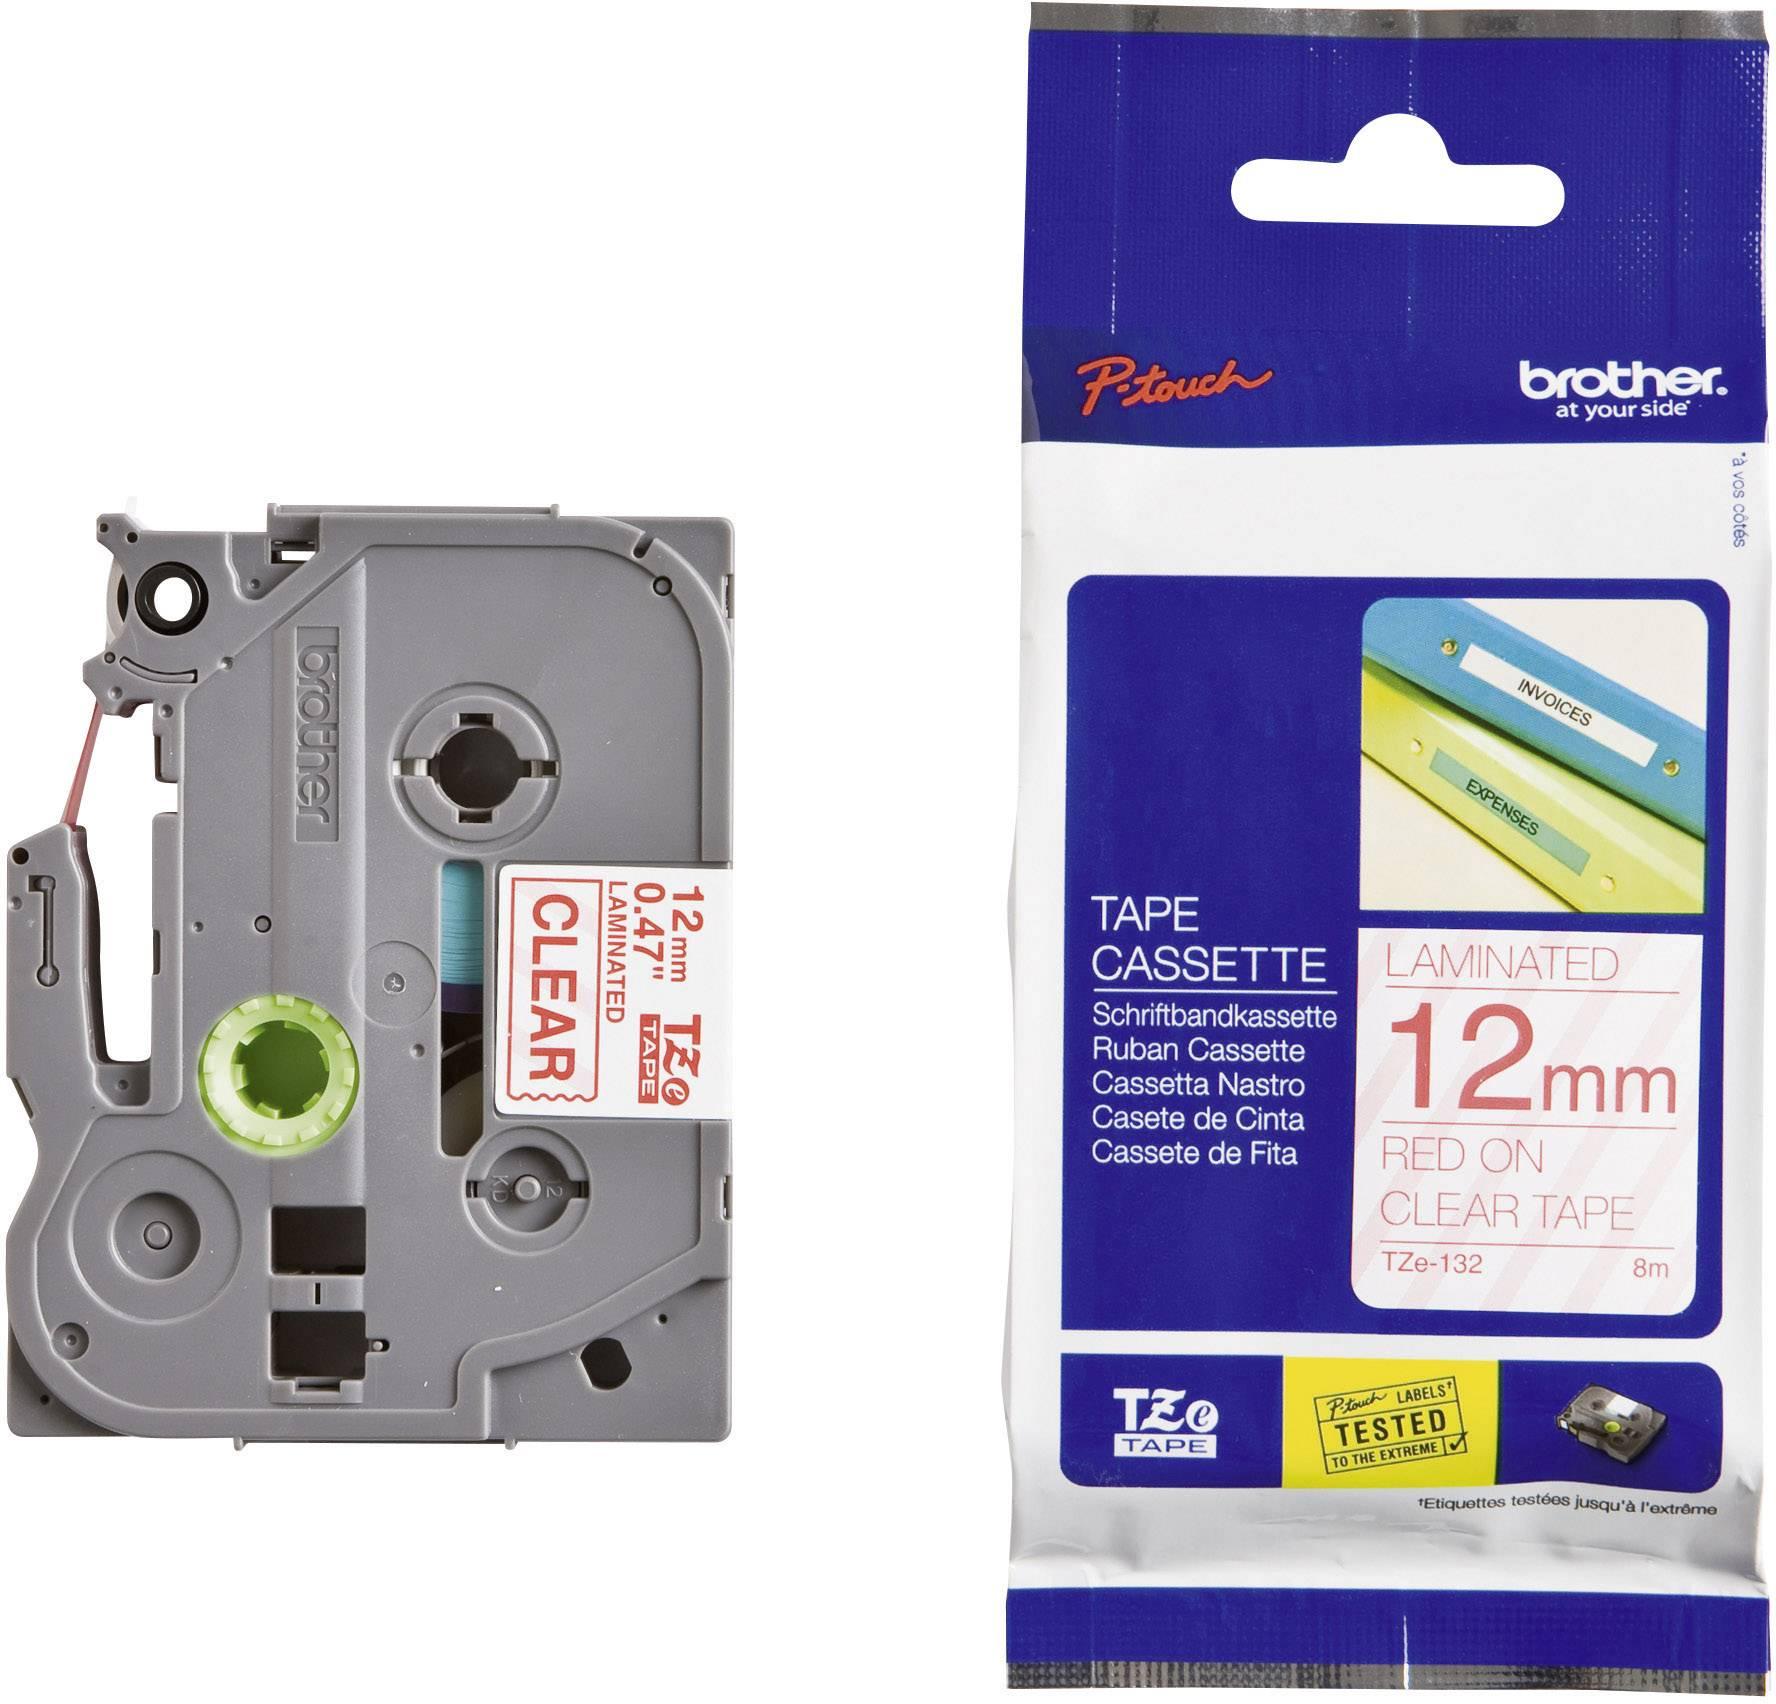 Páska do štítkovača Brother TZe-132, 5834067, 12 mm, TZe, TZ, 8 m, červená / transp.